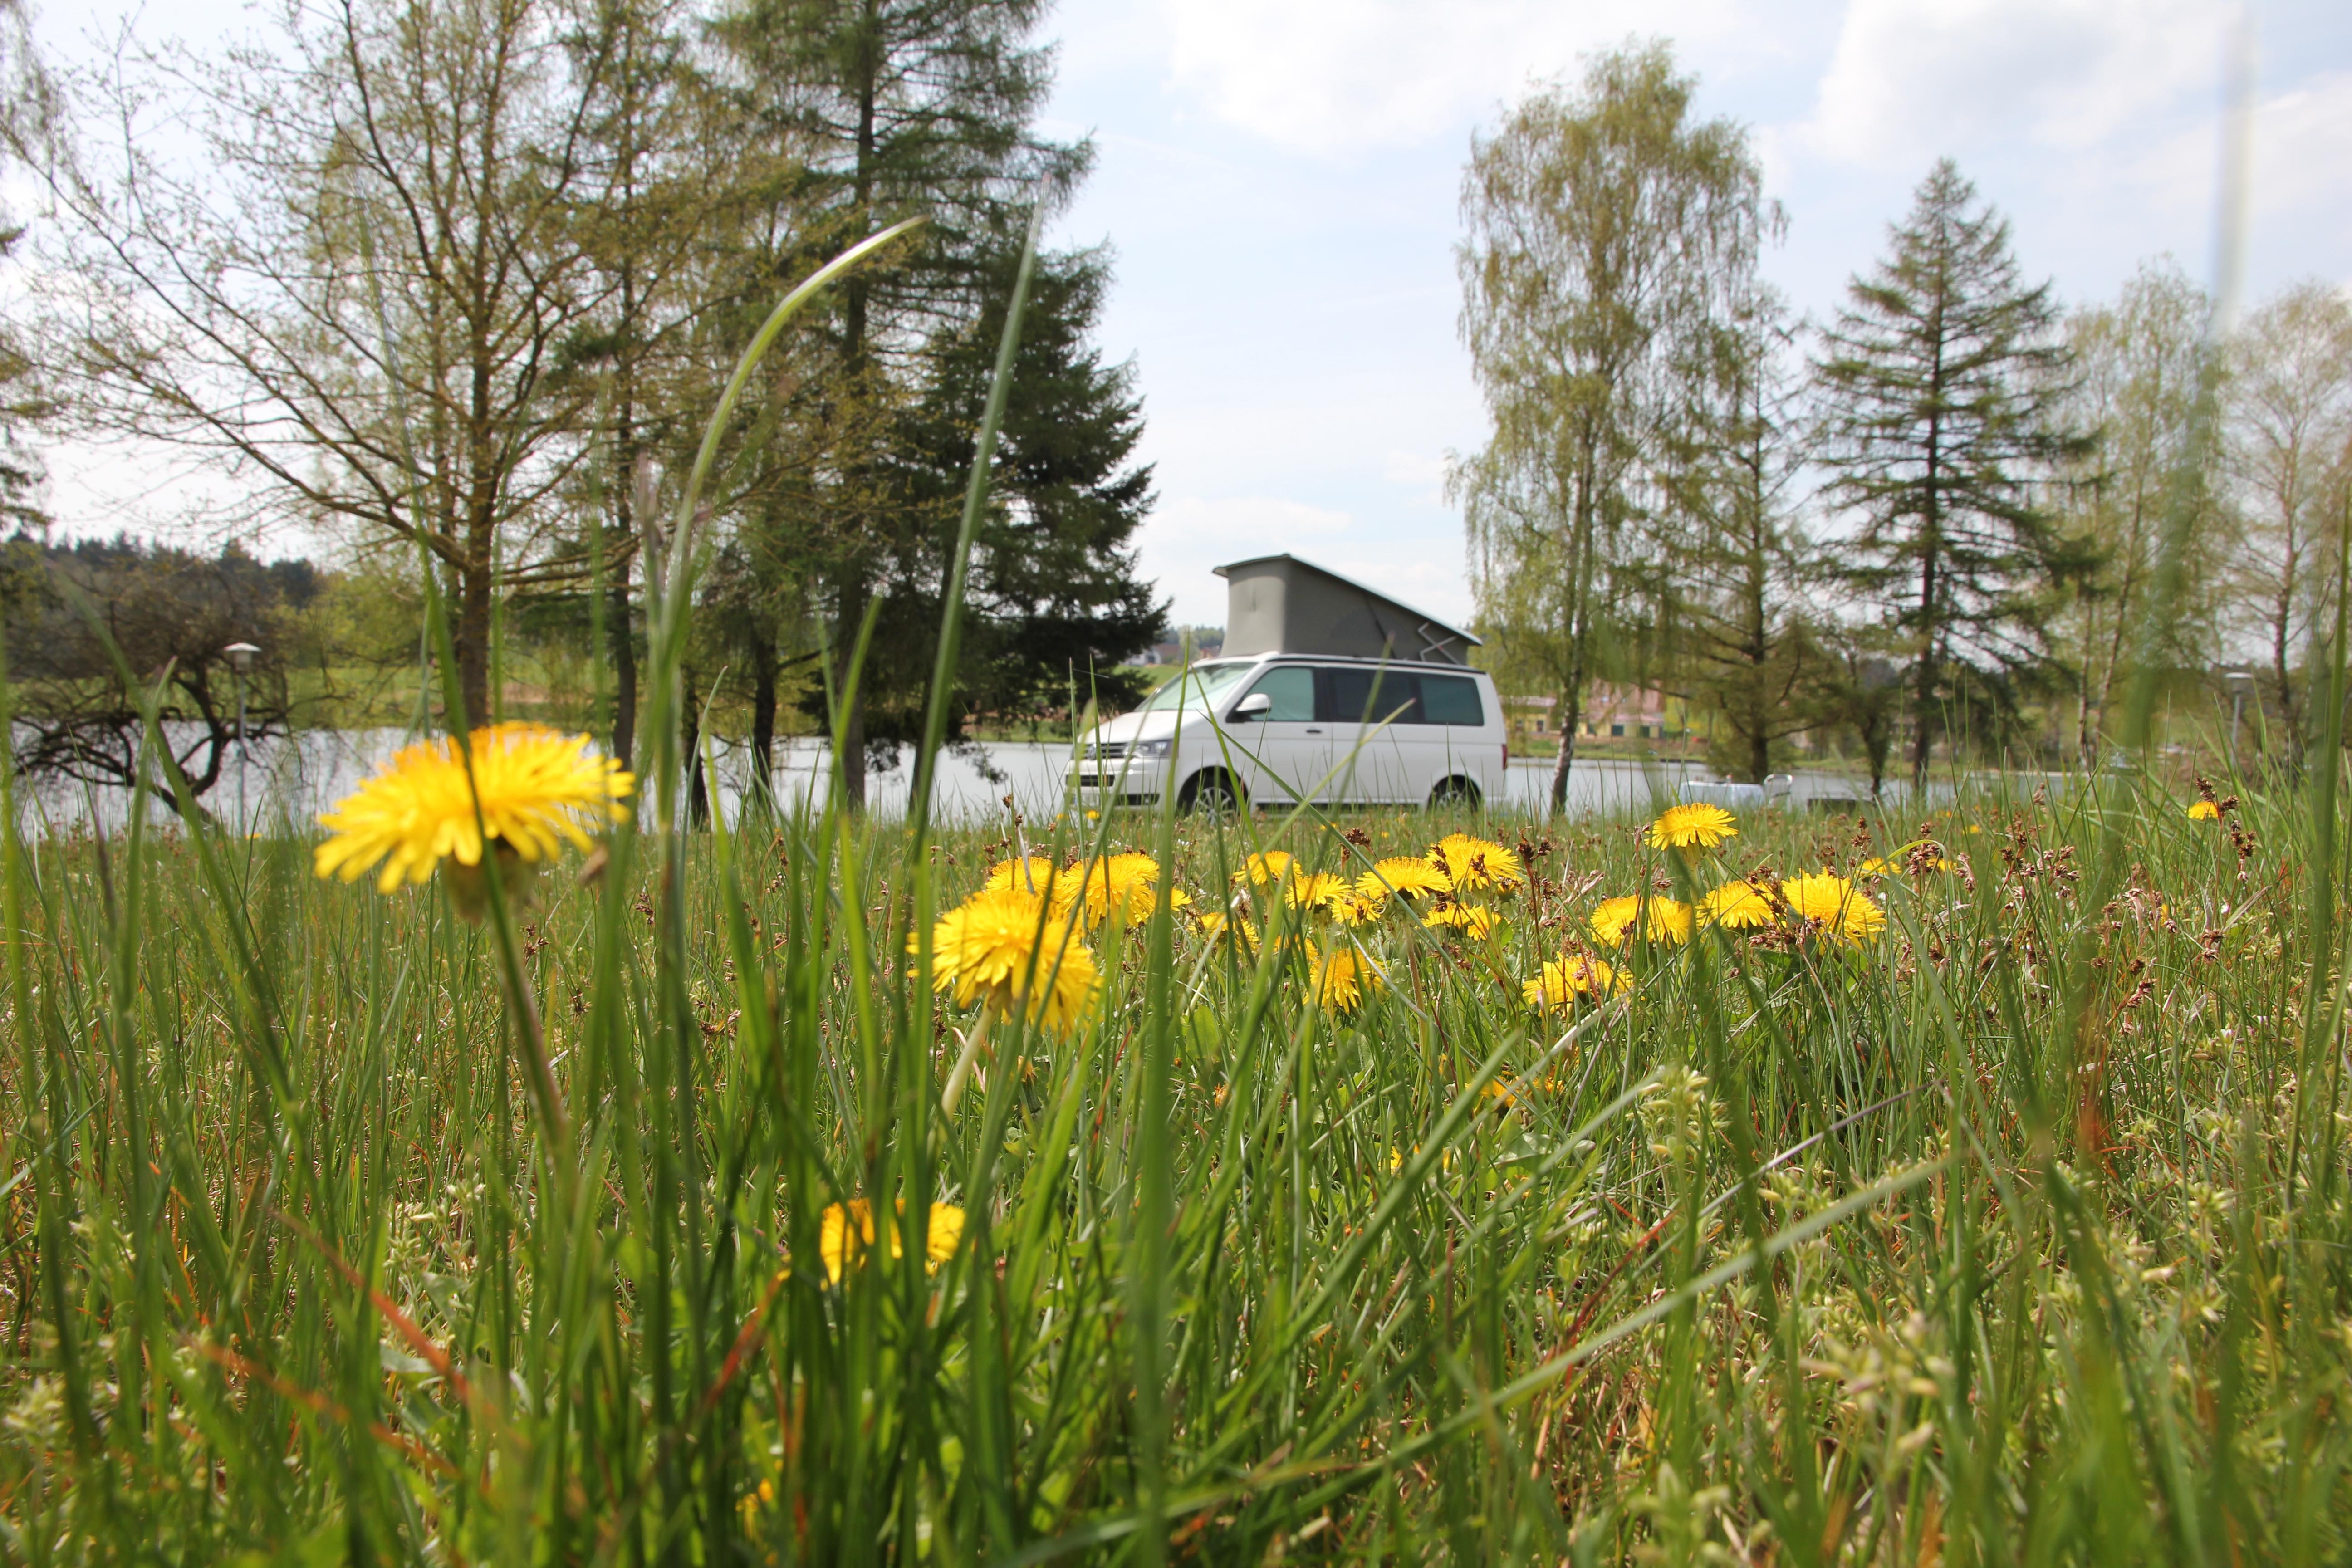 VW T5 California Frühling Sommer Löwenzahn See Campingplatz Wiese Hammerschmiedesee Aalen Abtsgmünd